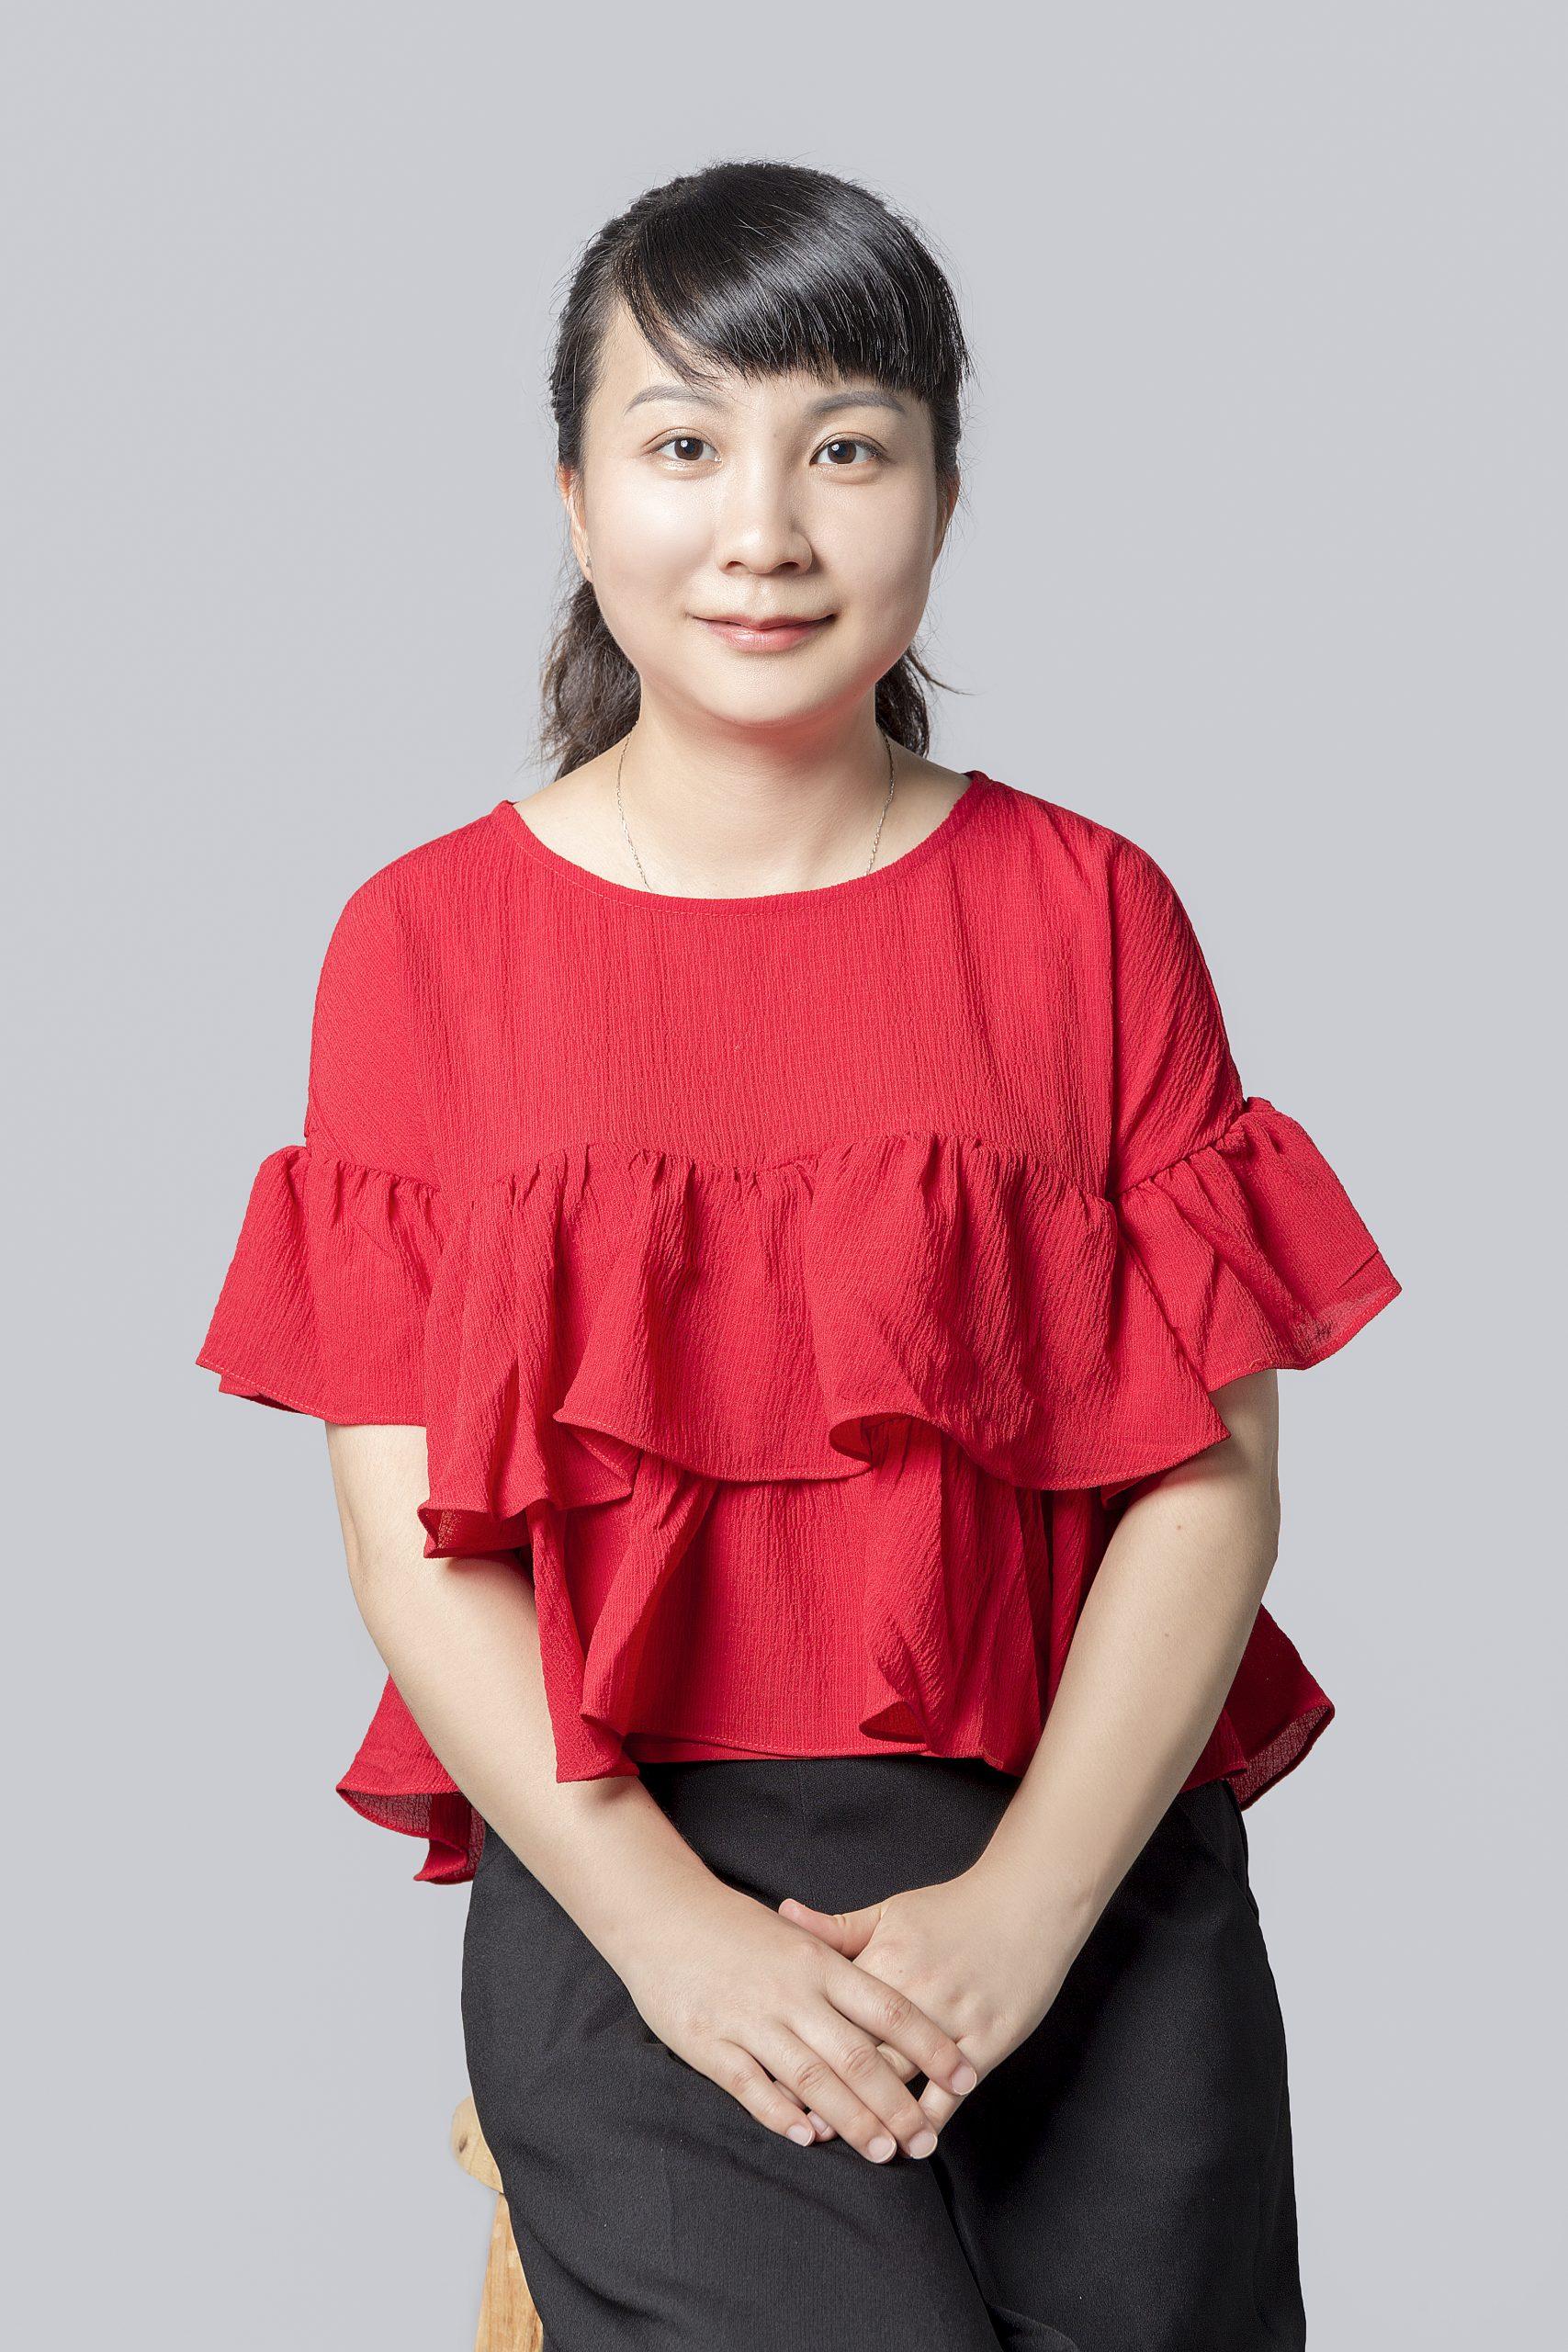 Photo of Li Beilei